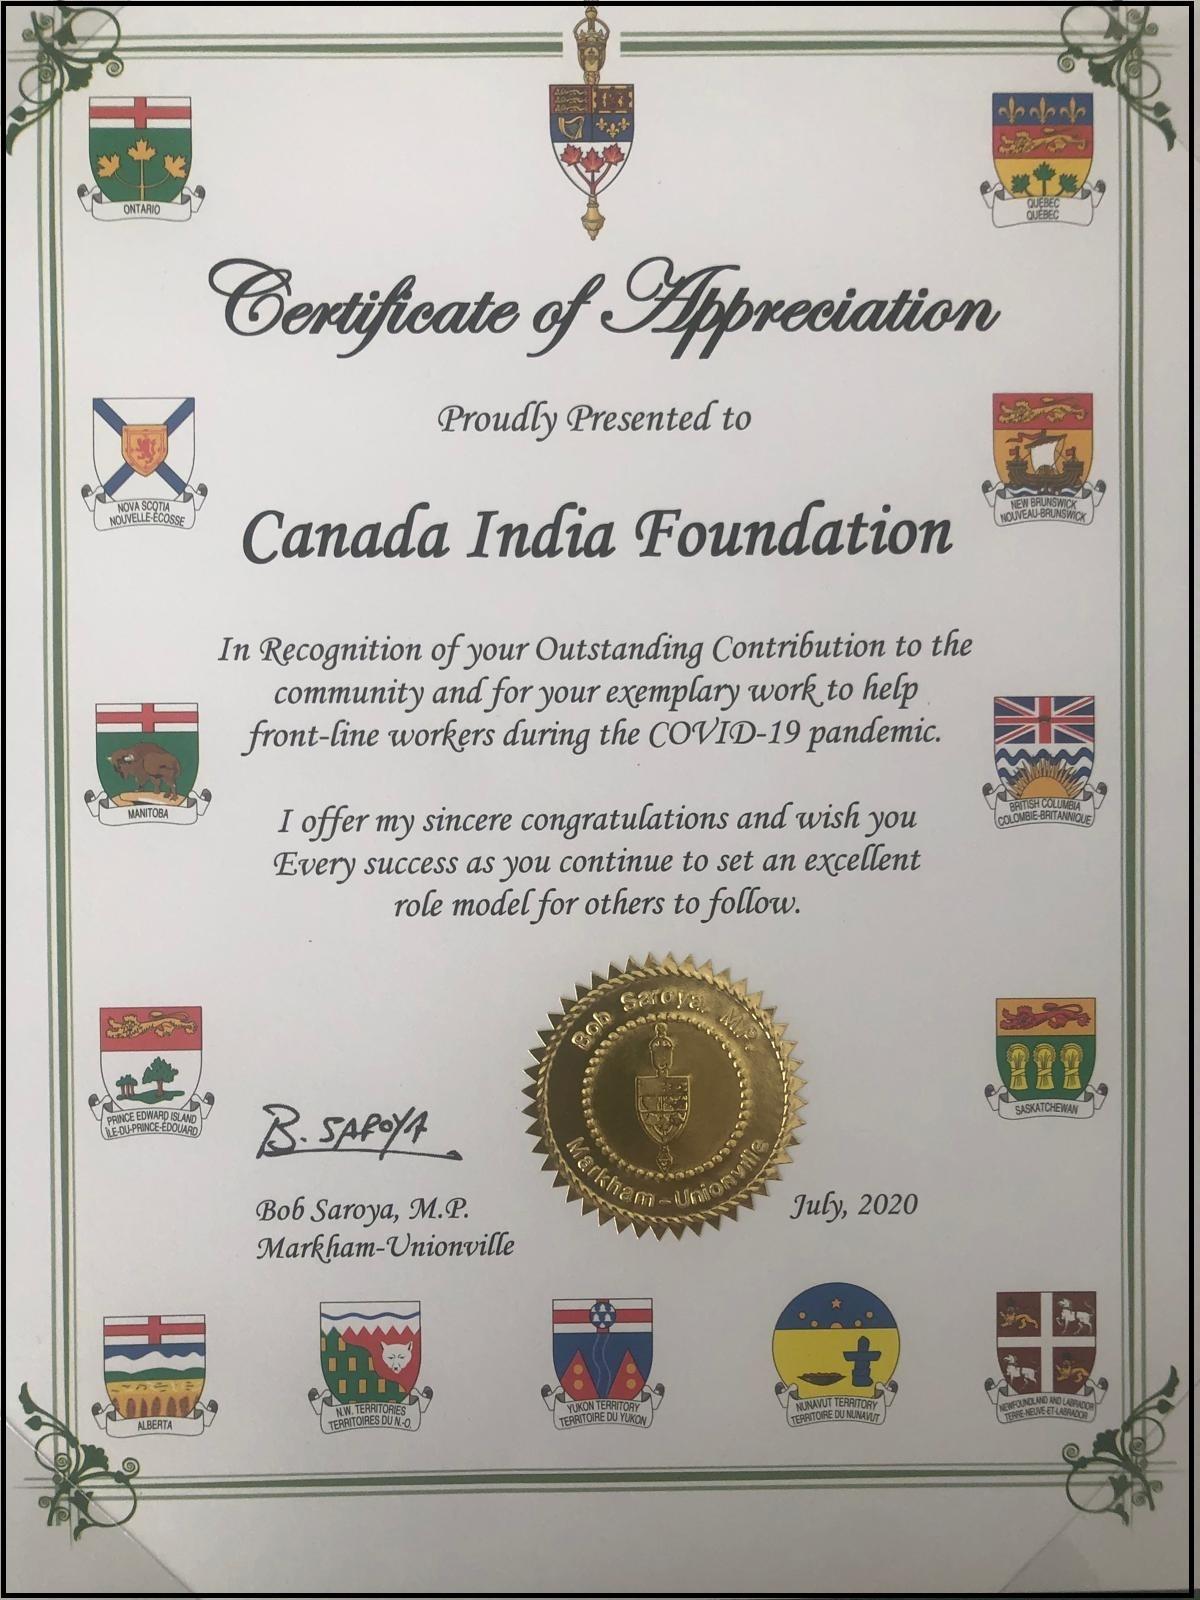 Letter of Appreciation by Bob Saroya, MP